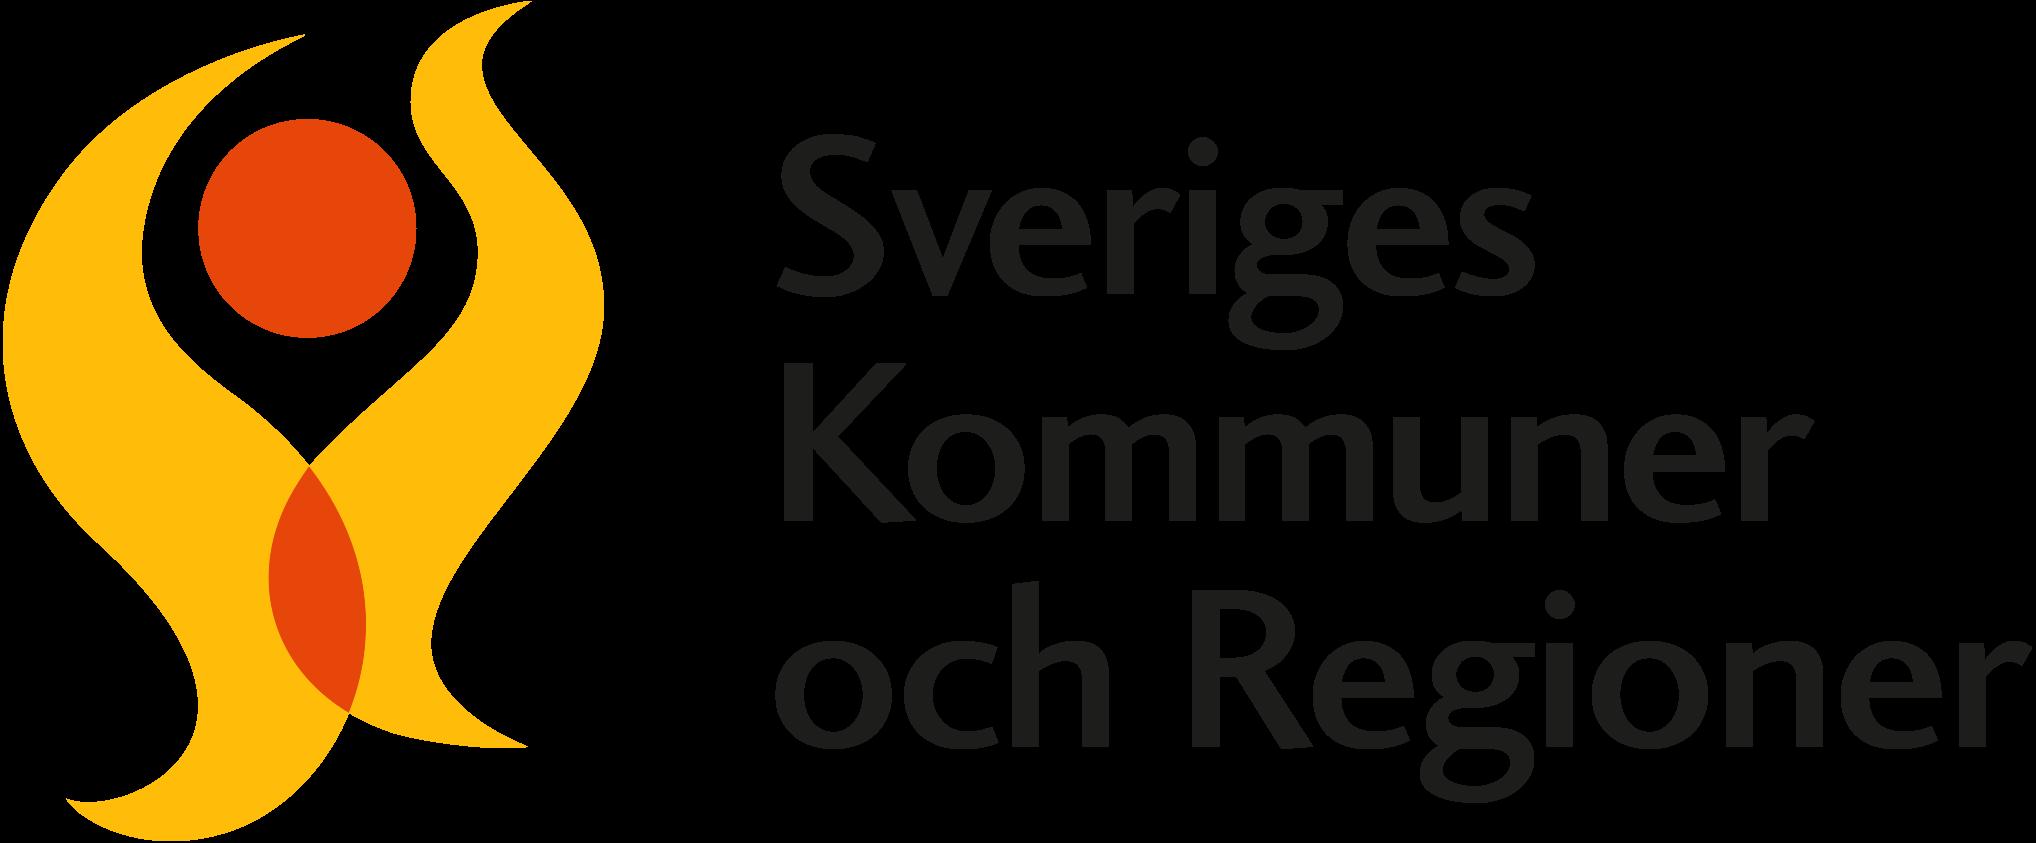 RGB_SKR_Logotype